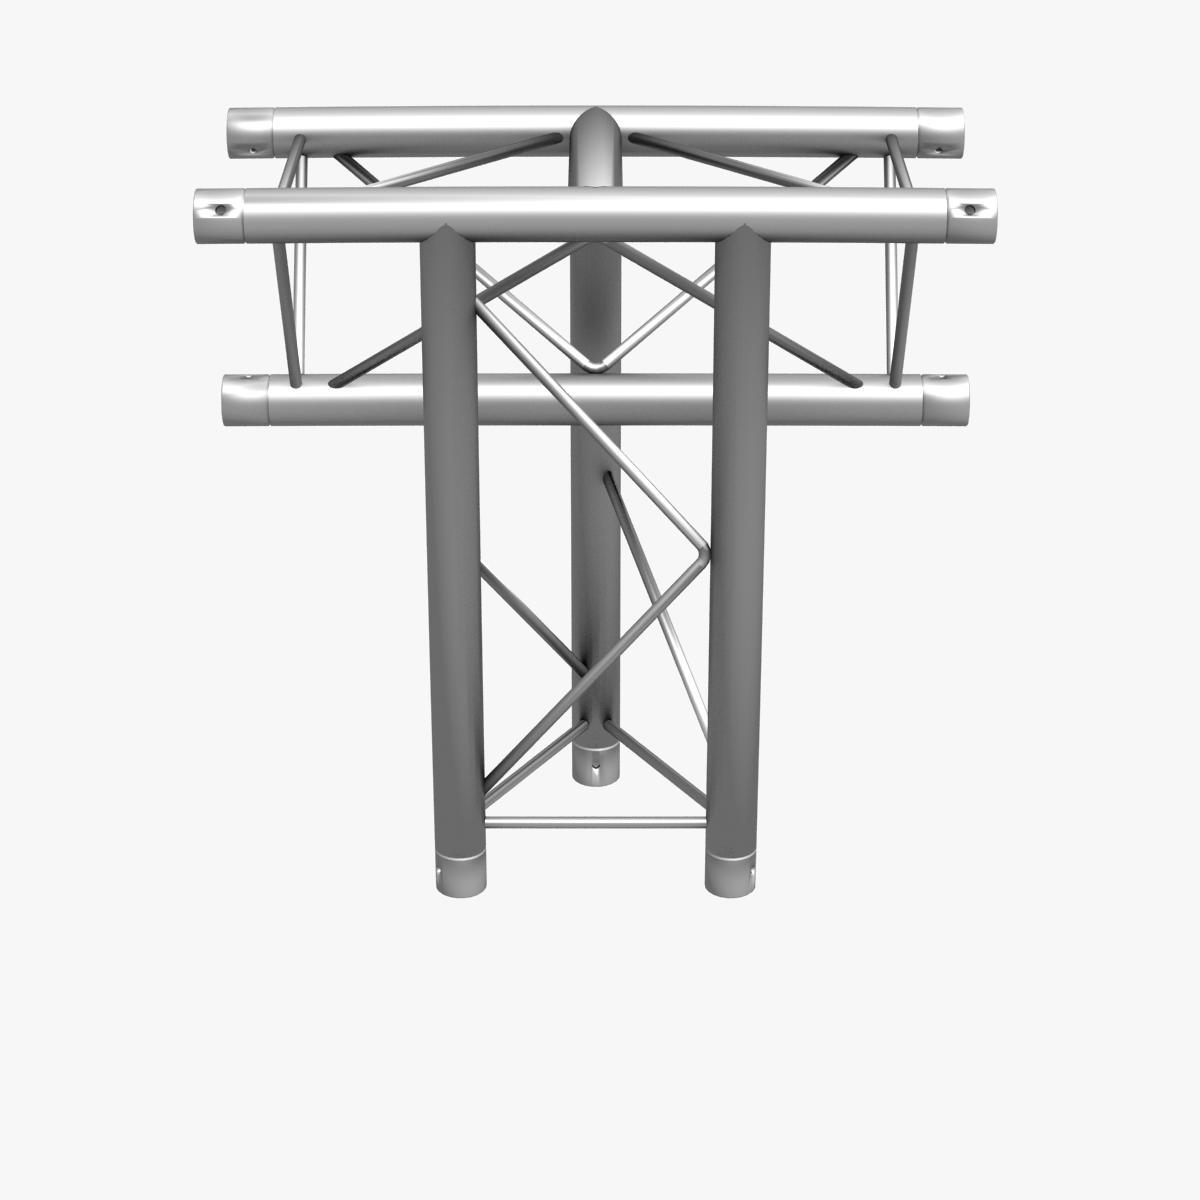 triangular trusses (collection 55 modular pieces) 3d model 3ds max dxf fbx c4d dae texture obj 216261